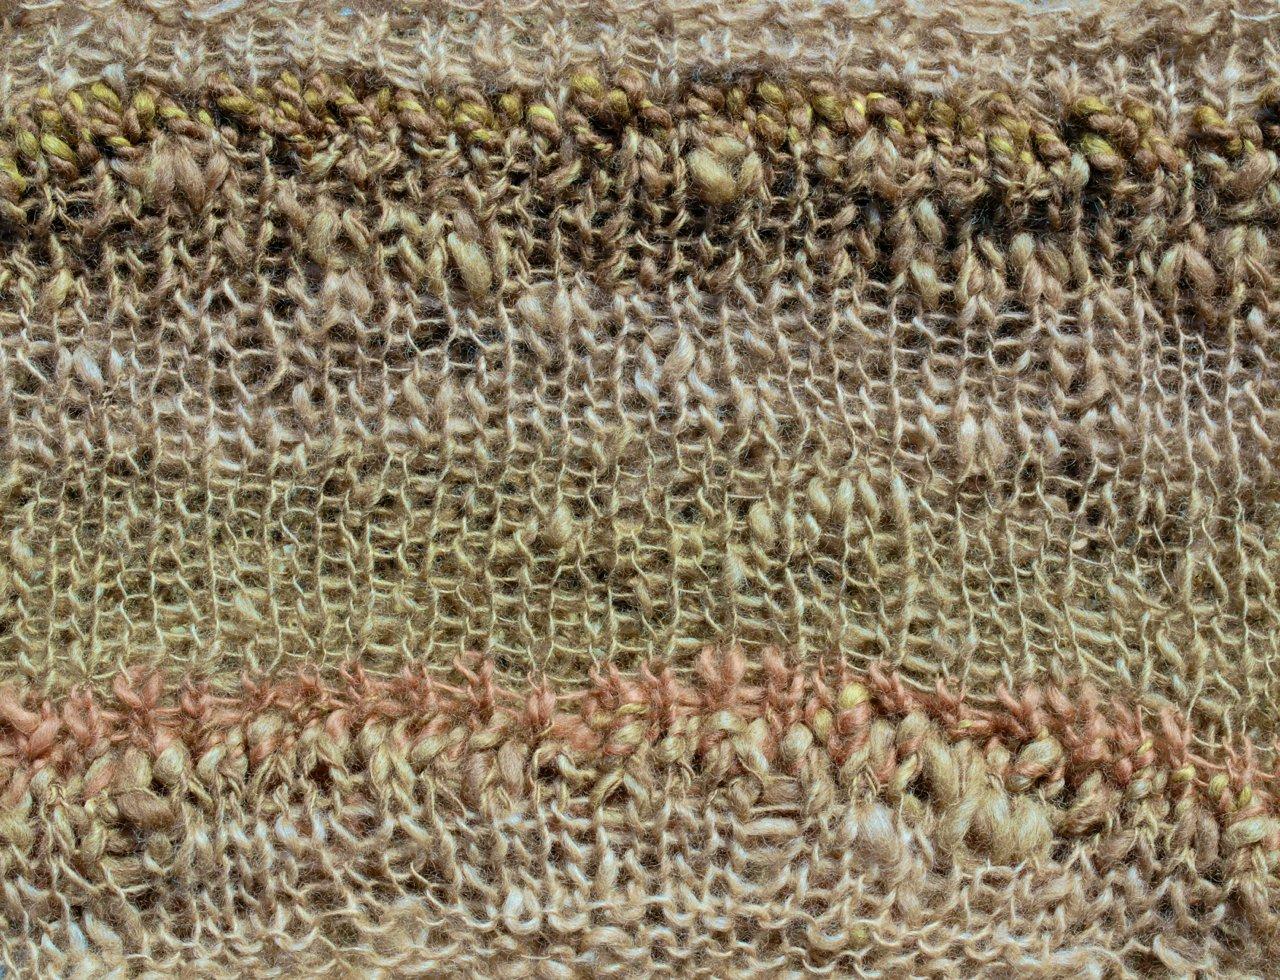 Yarn by Solo Full-time RVing Artist Weaver Eloise